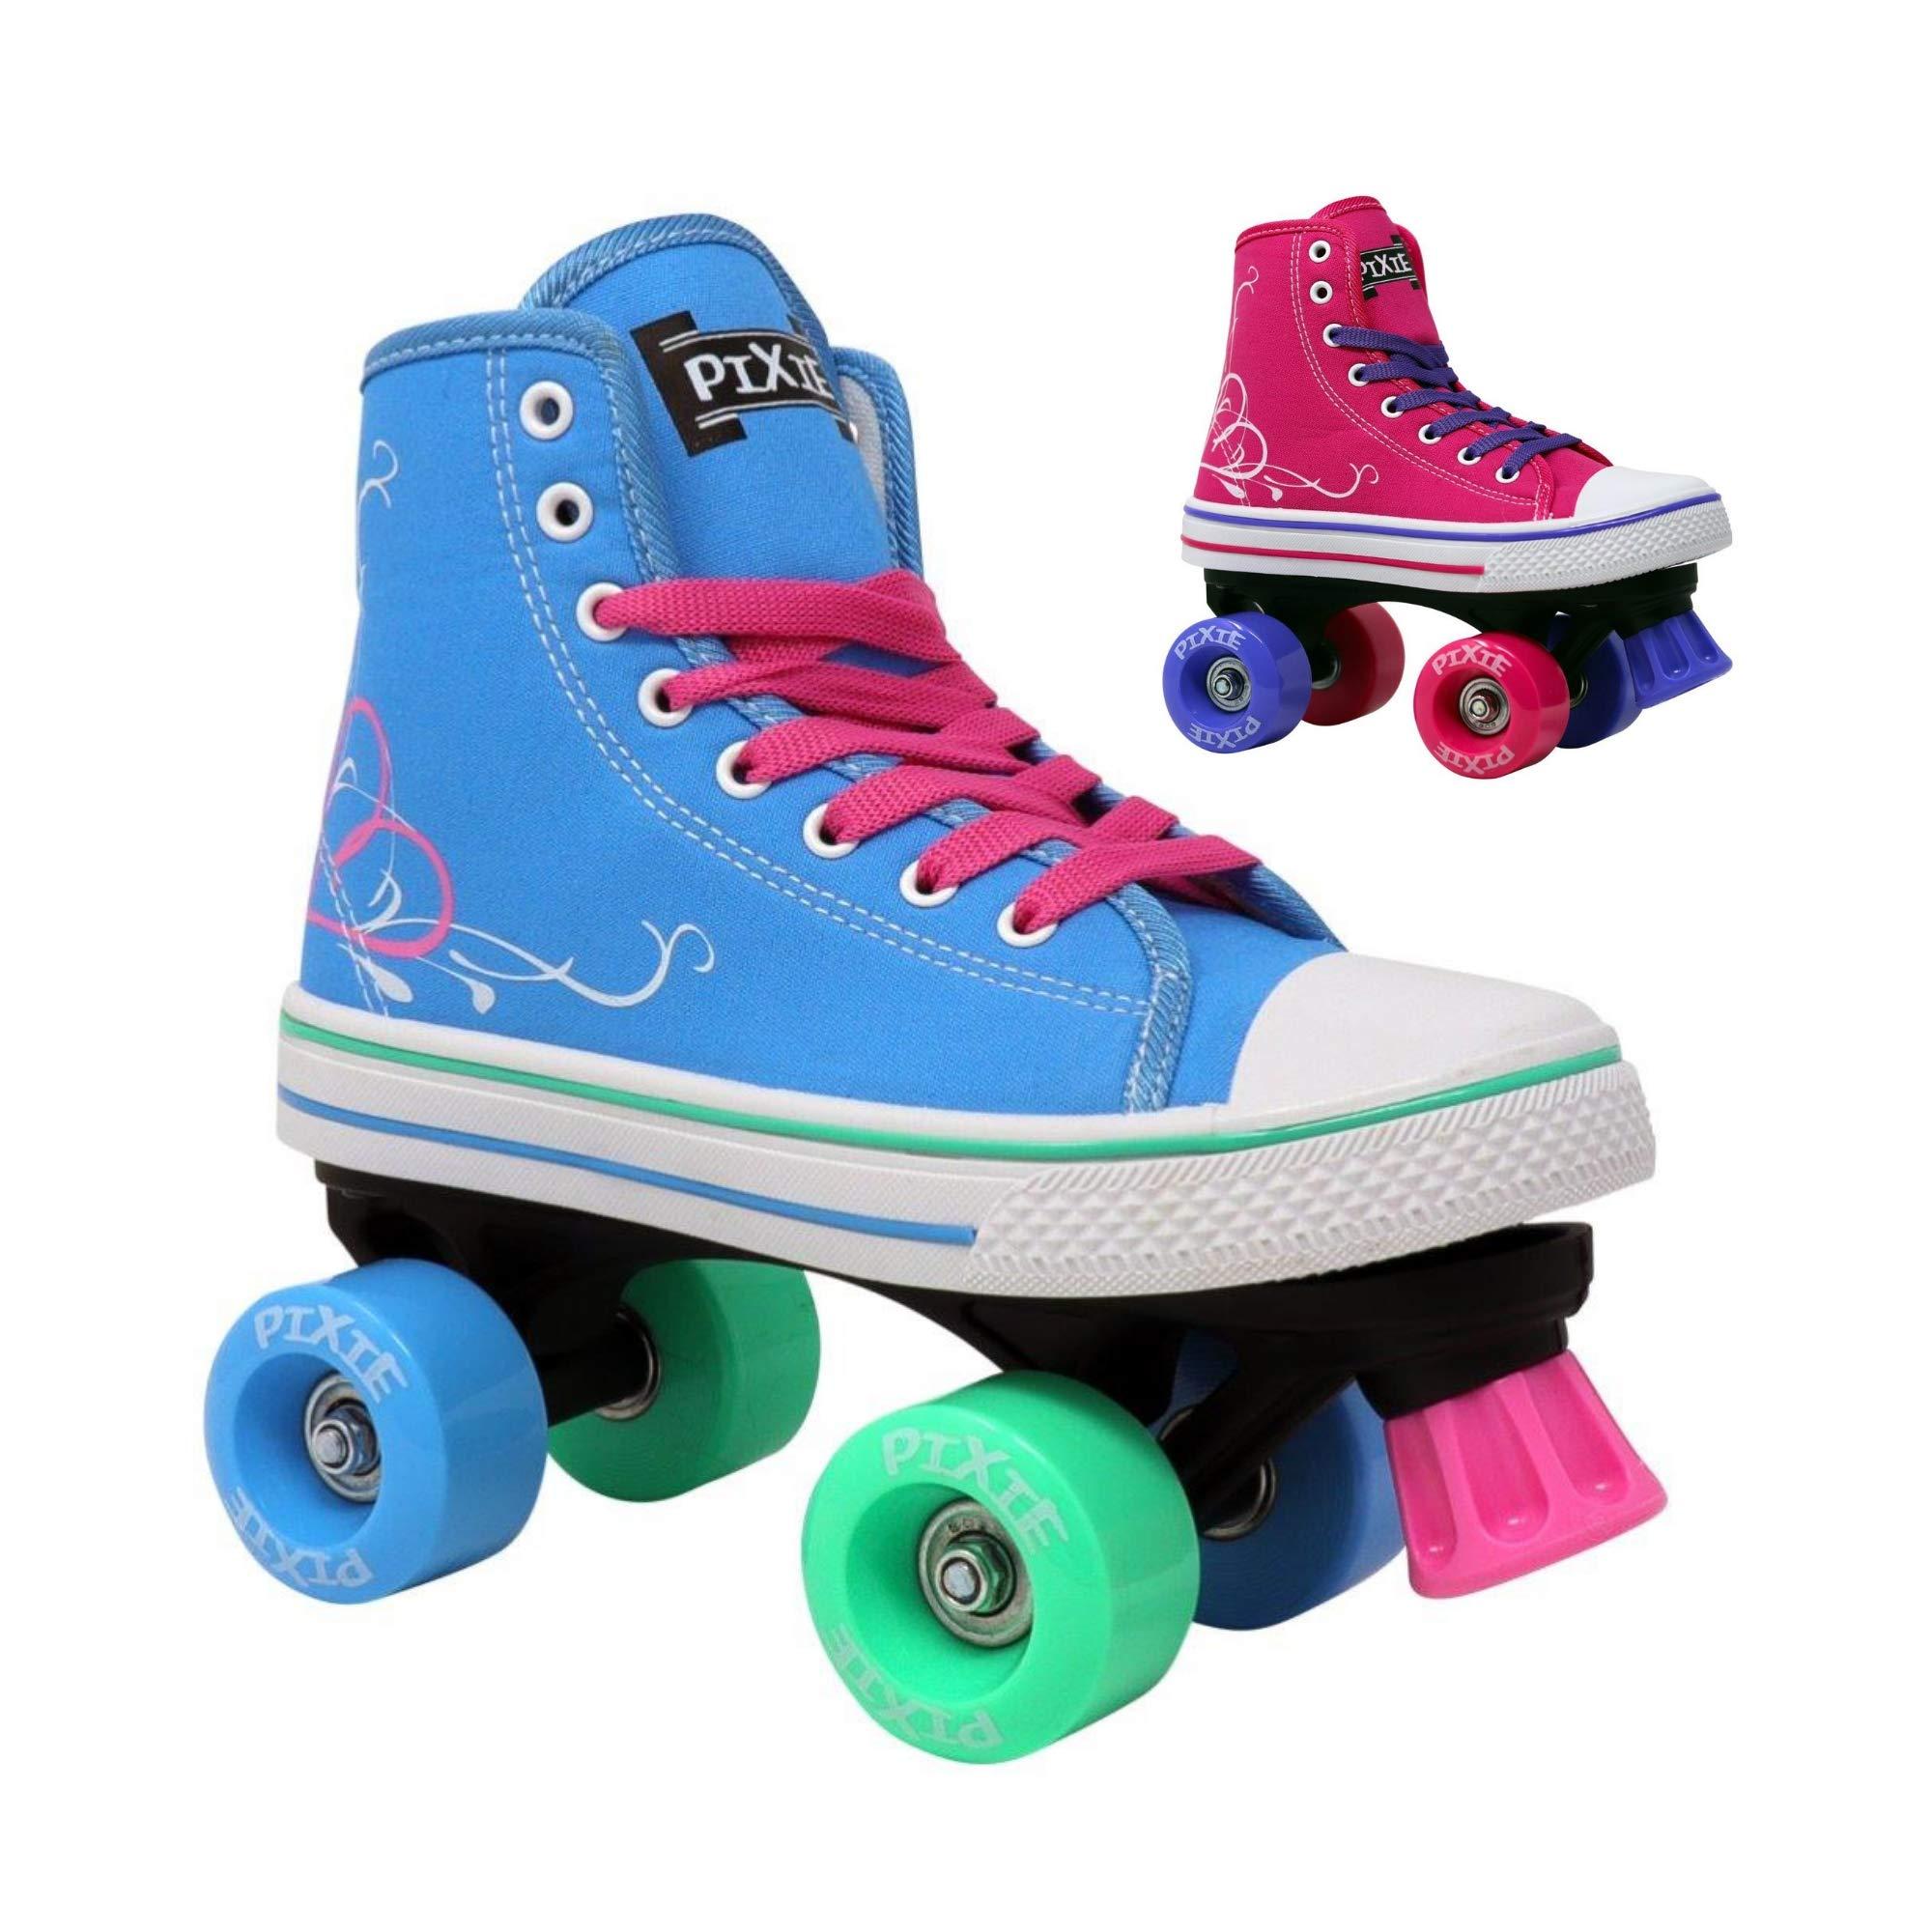 Lenexa Roller Skates for Girls Pixie Kid's Quad Roller Skates with High Top Shoe Style for Indoor/Outdoor Skating | Durable, Easy to Skate, Made for Kids (Blue, 2)